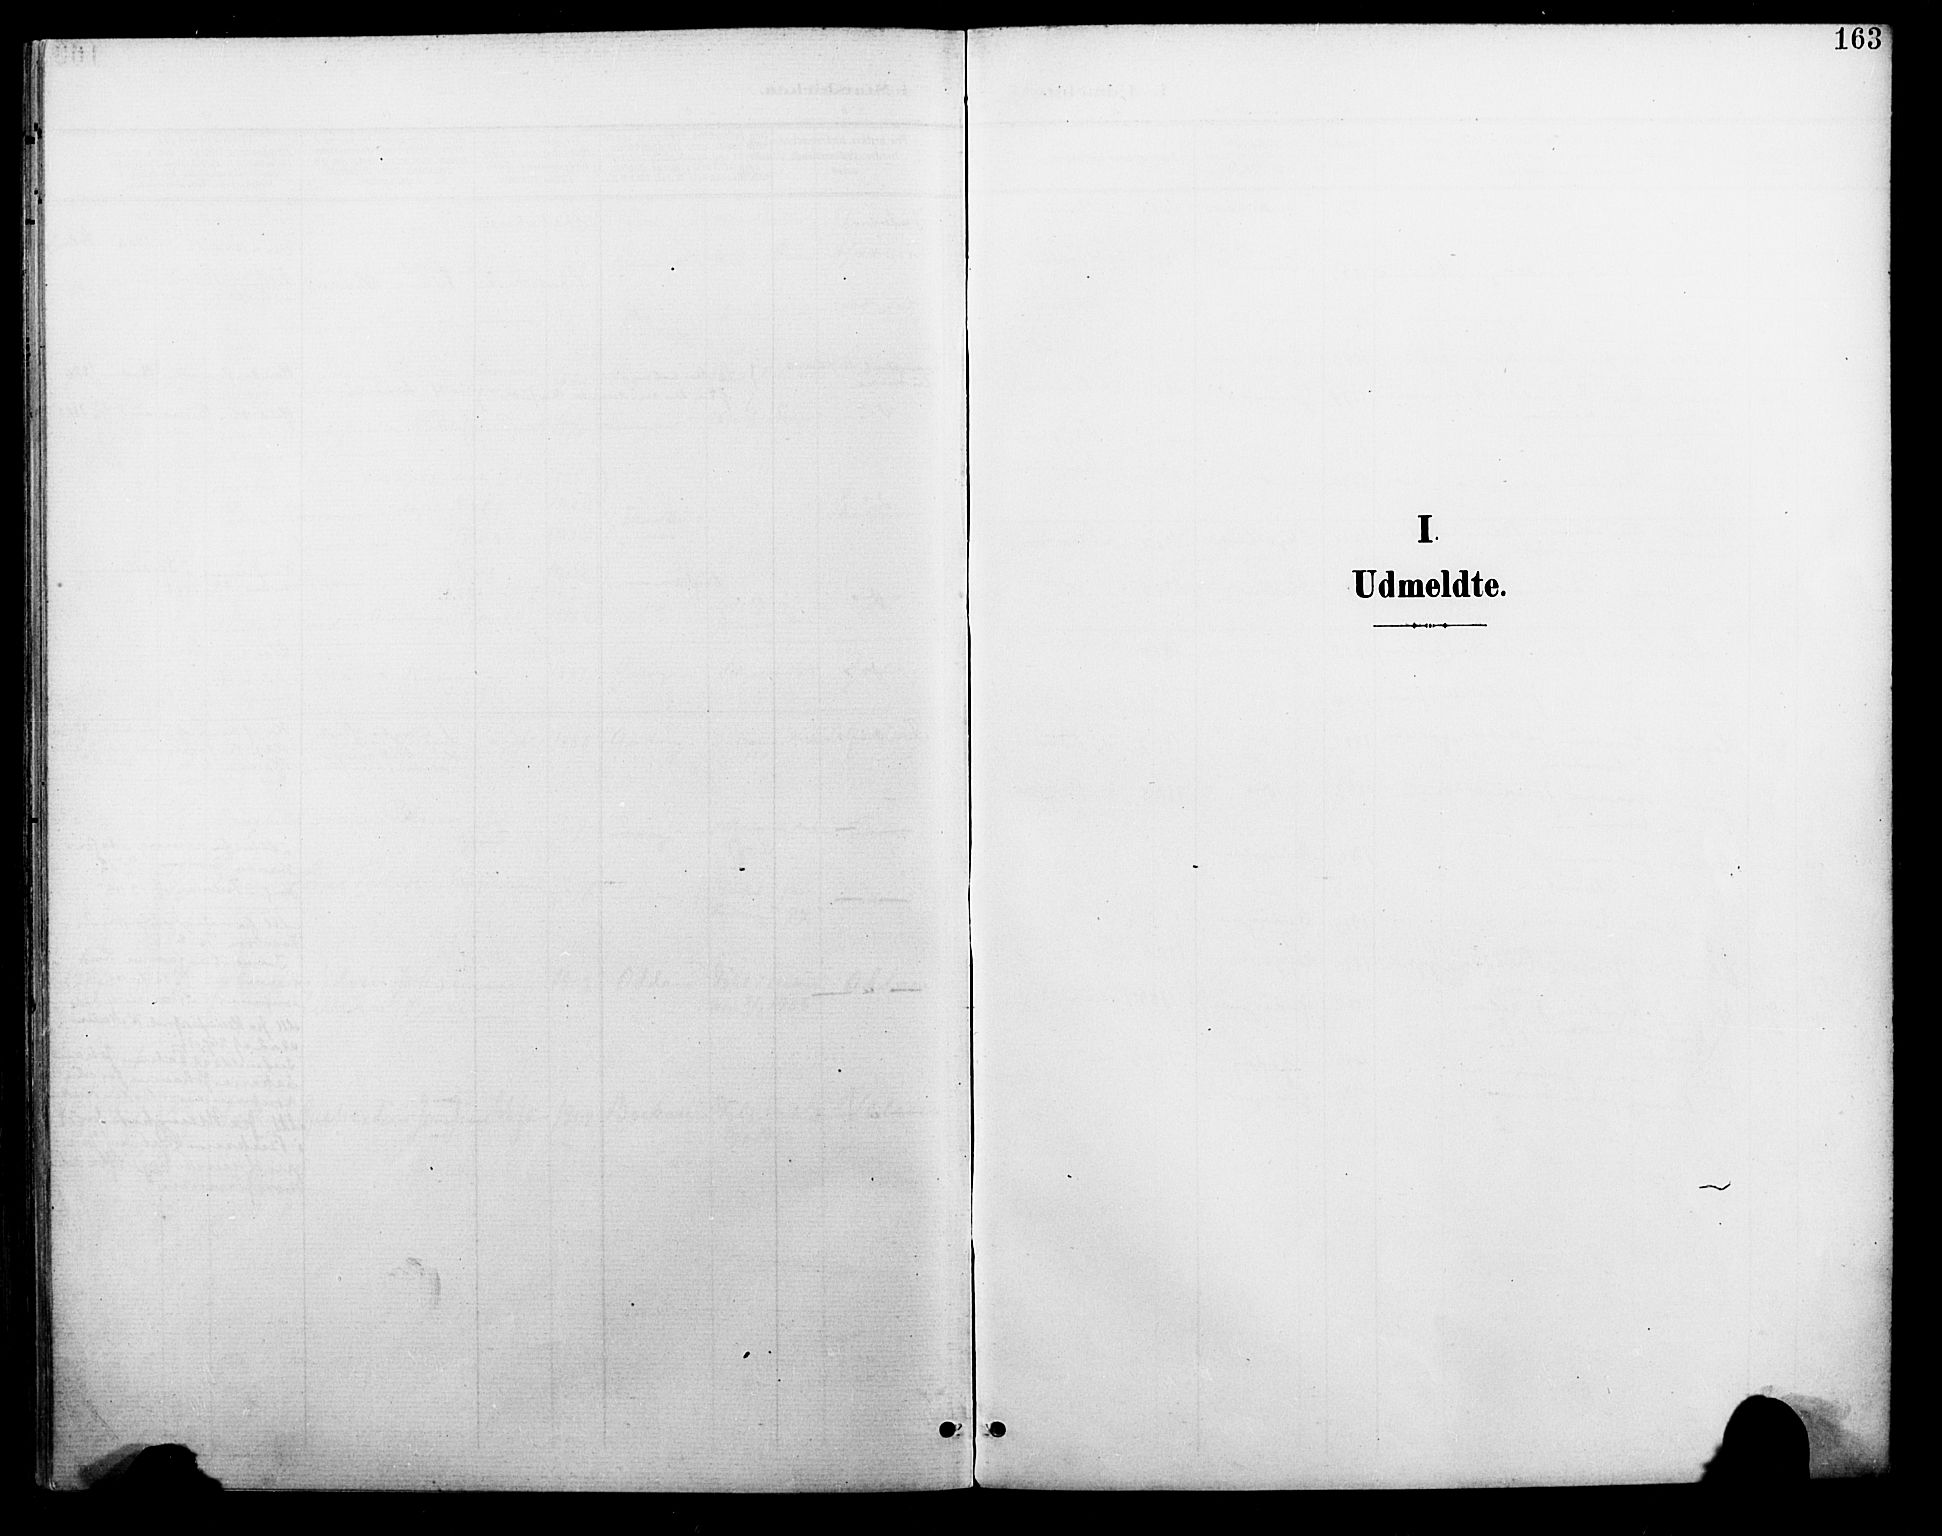 SAT, Ministerialprotokoller, klokkerbøker og fødselsregistre - Nordland, 804/L0088: Klokkerbok nr. 804C01, 1901-1917, s. 163